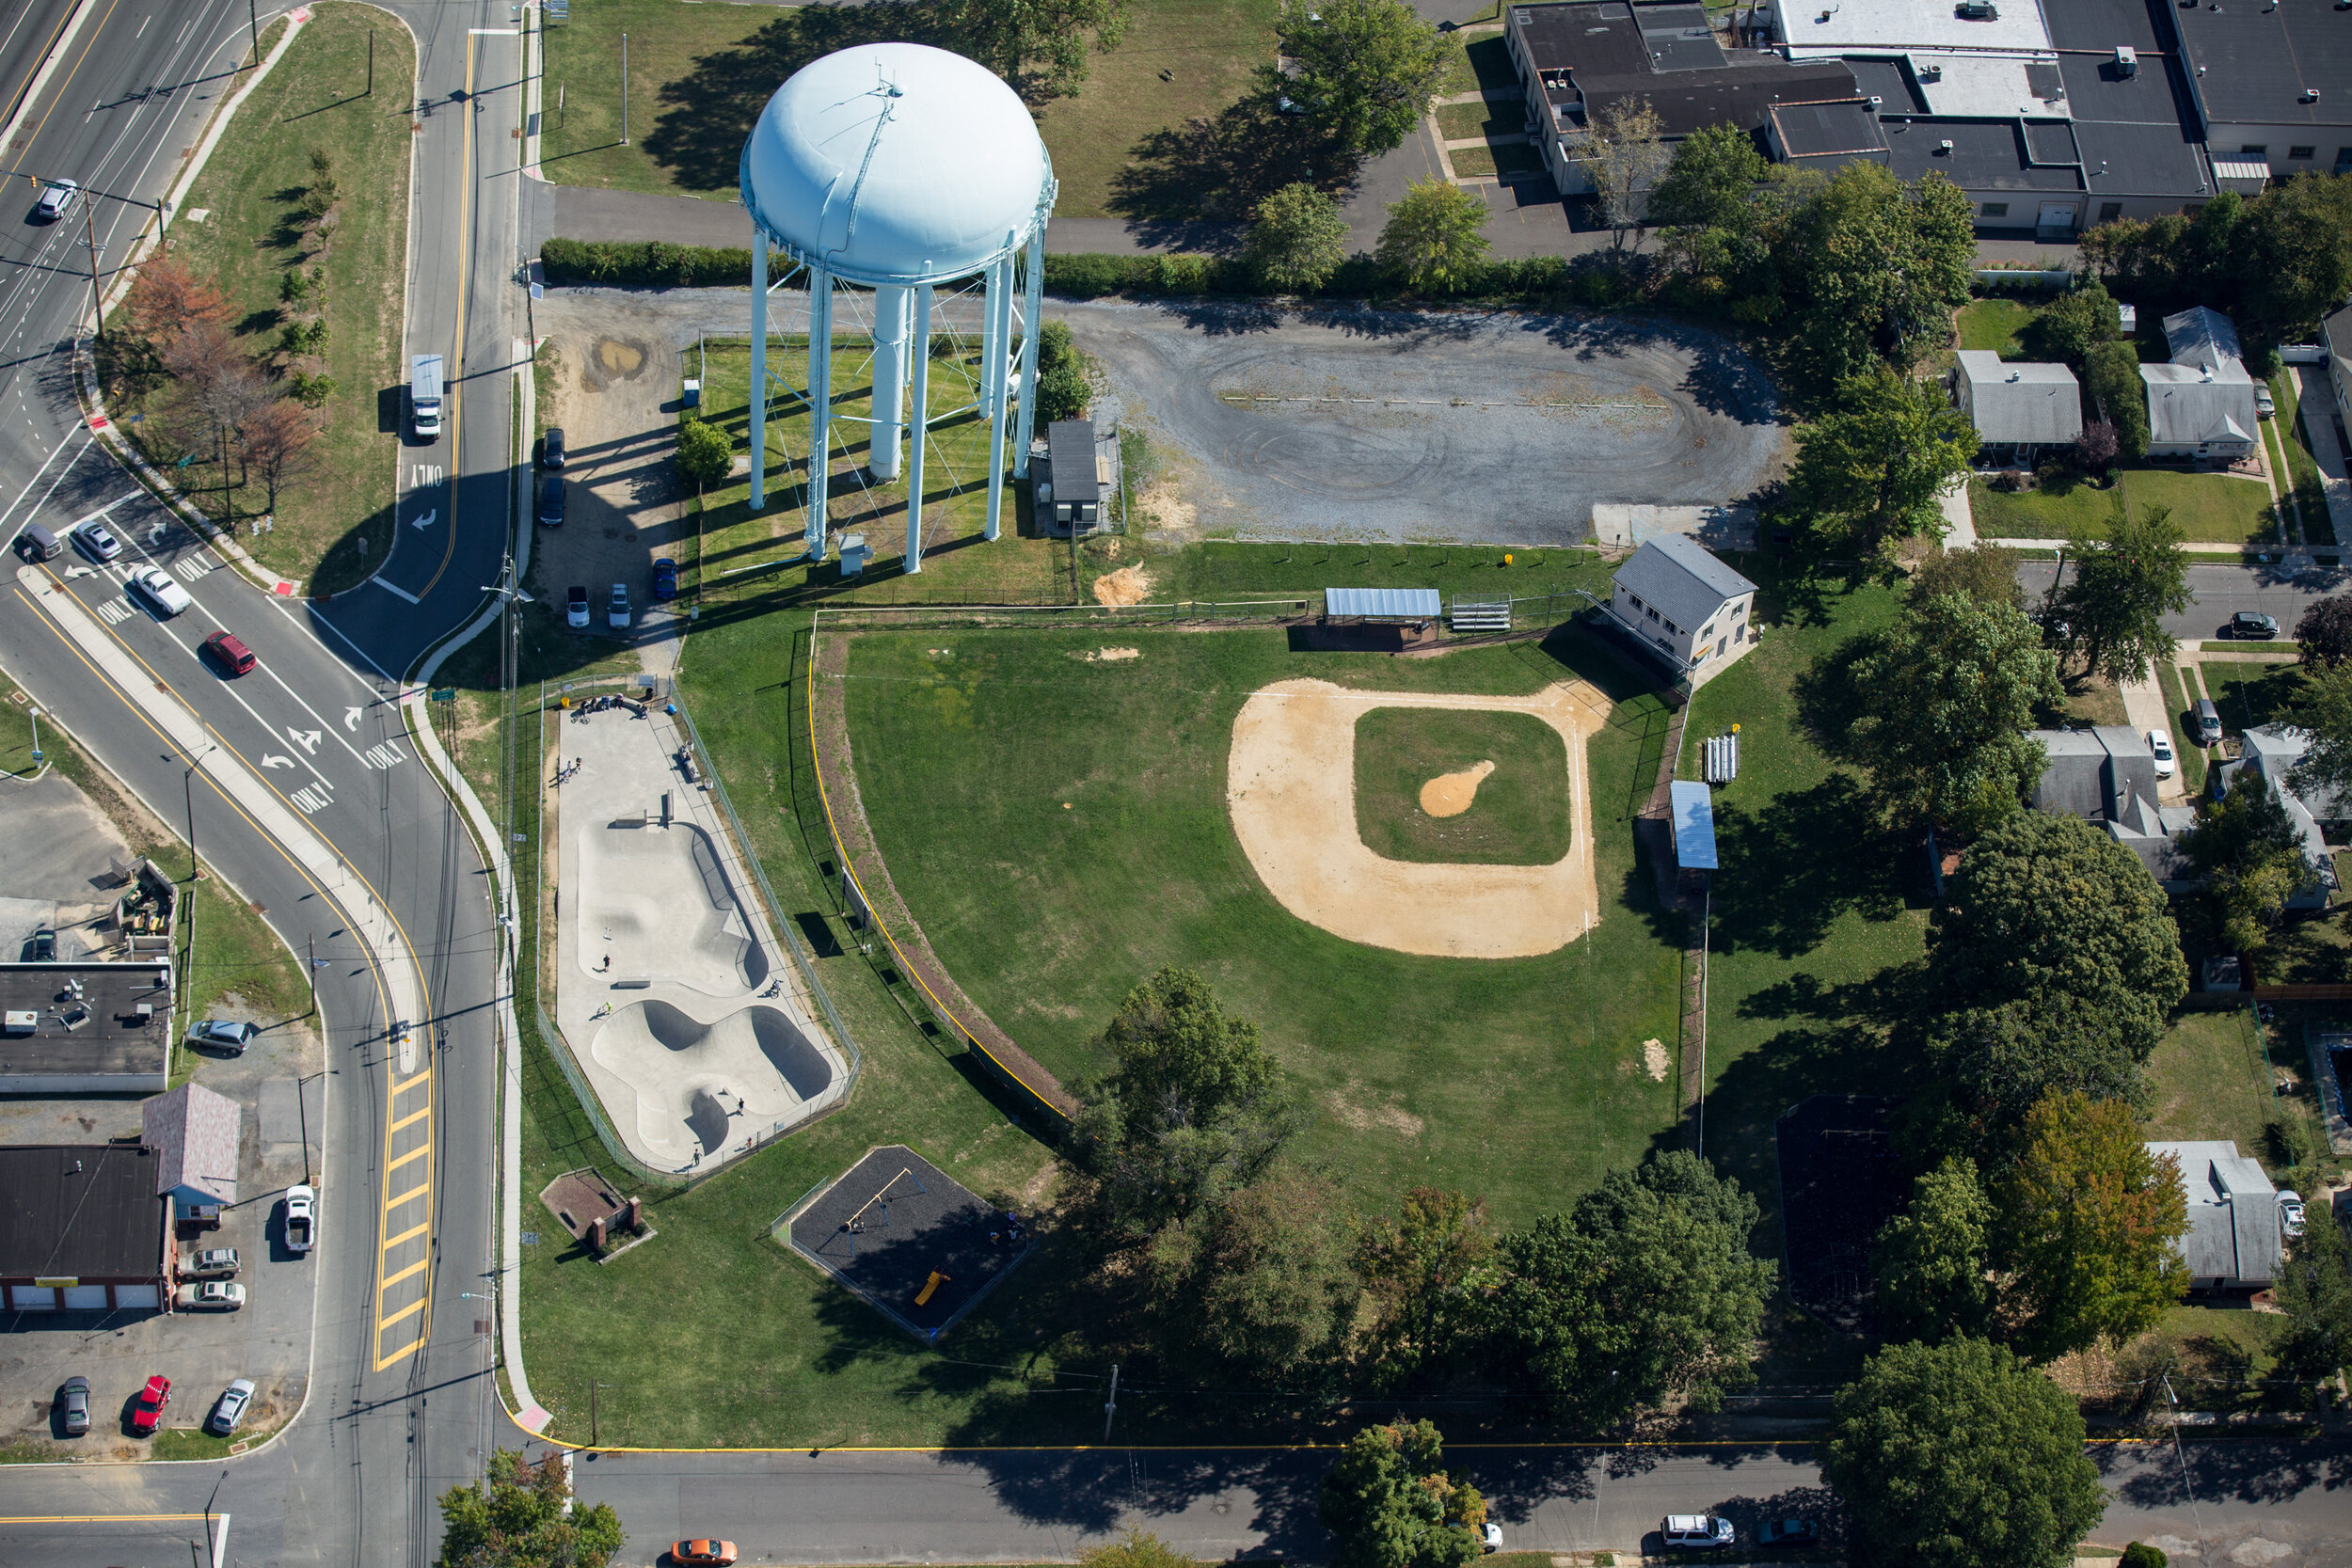 Skate park vs ball park.